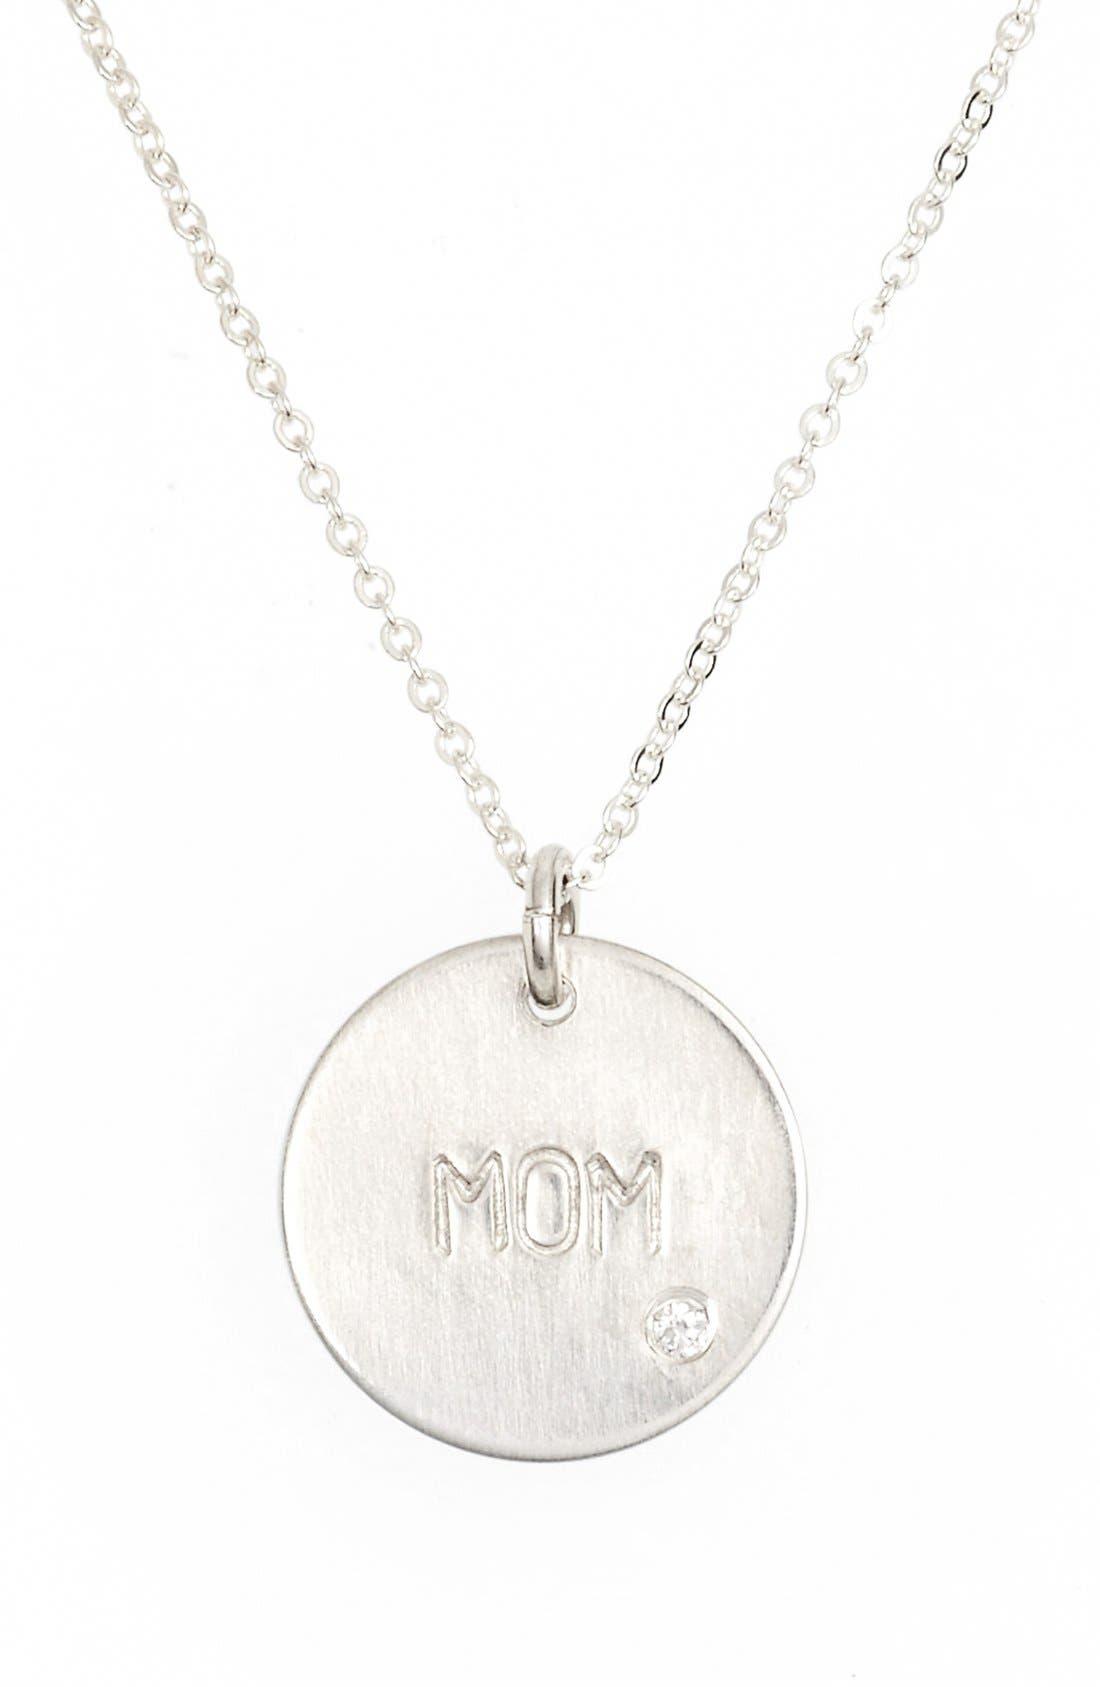 nashelle pendant necklace nordstrom